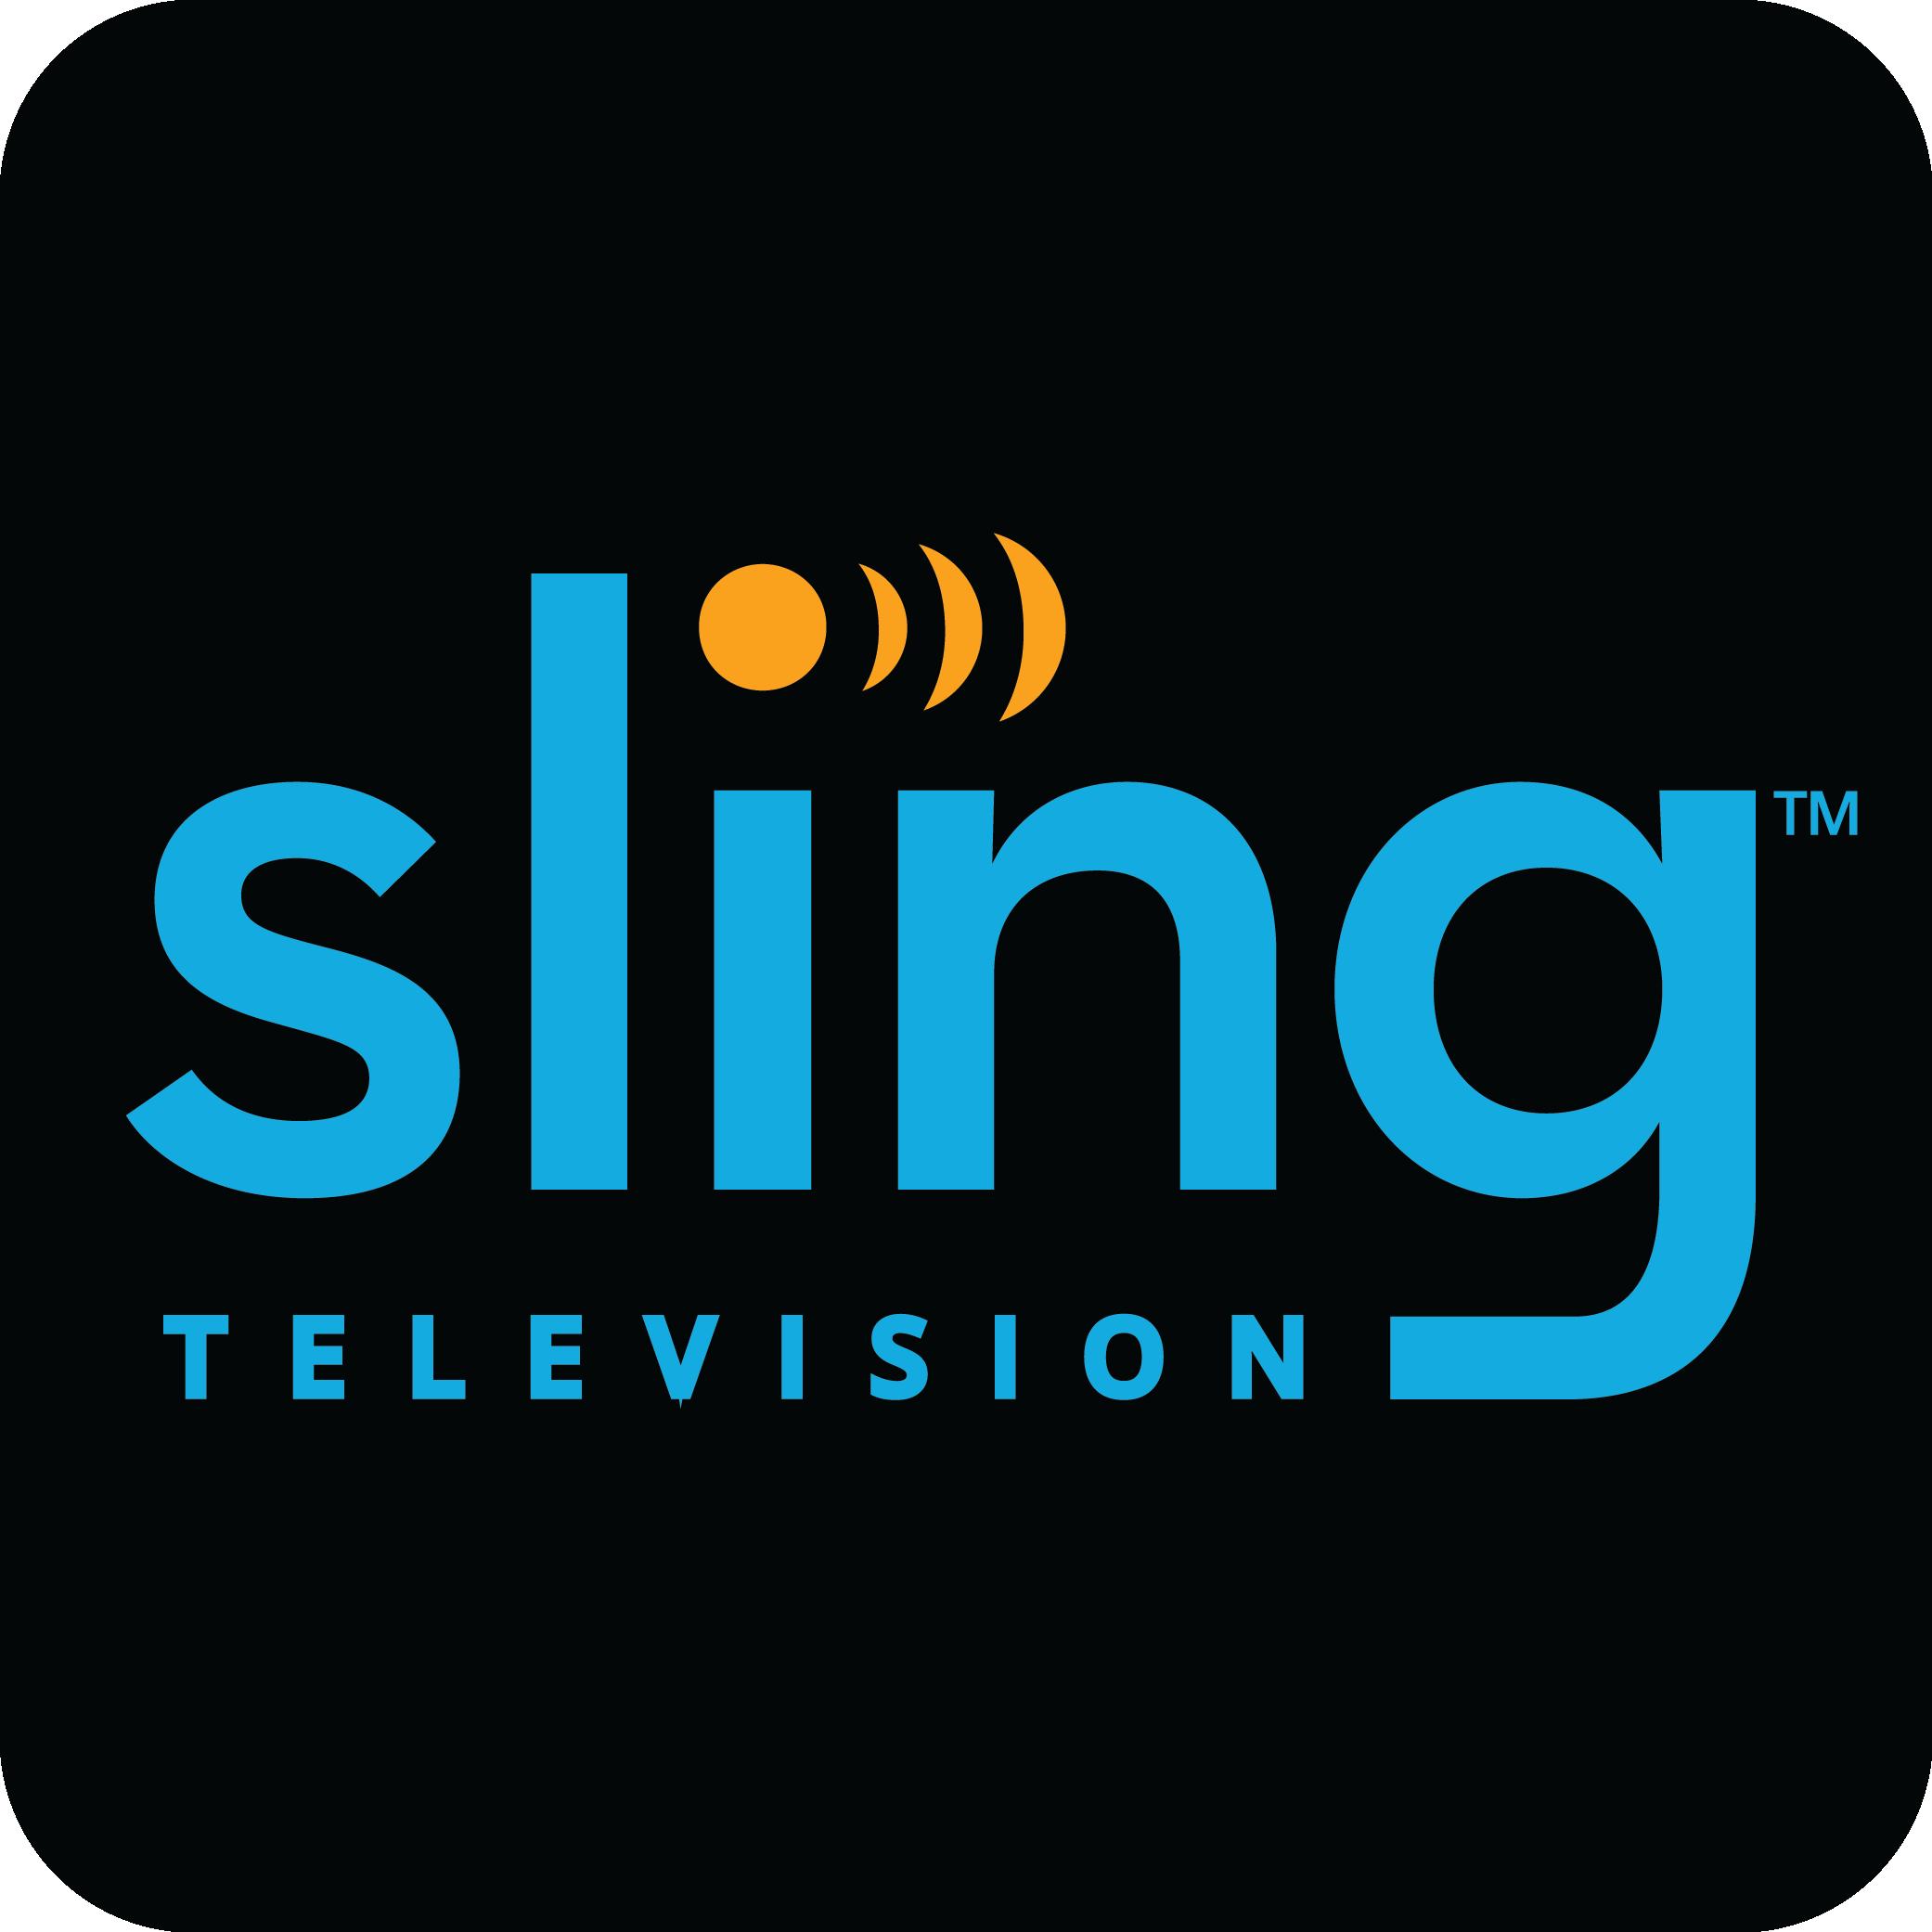 sling tv orange is free for presidential debate nfl football. Black Bedroom Furniture Sets. Home Design Ideas